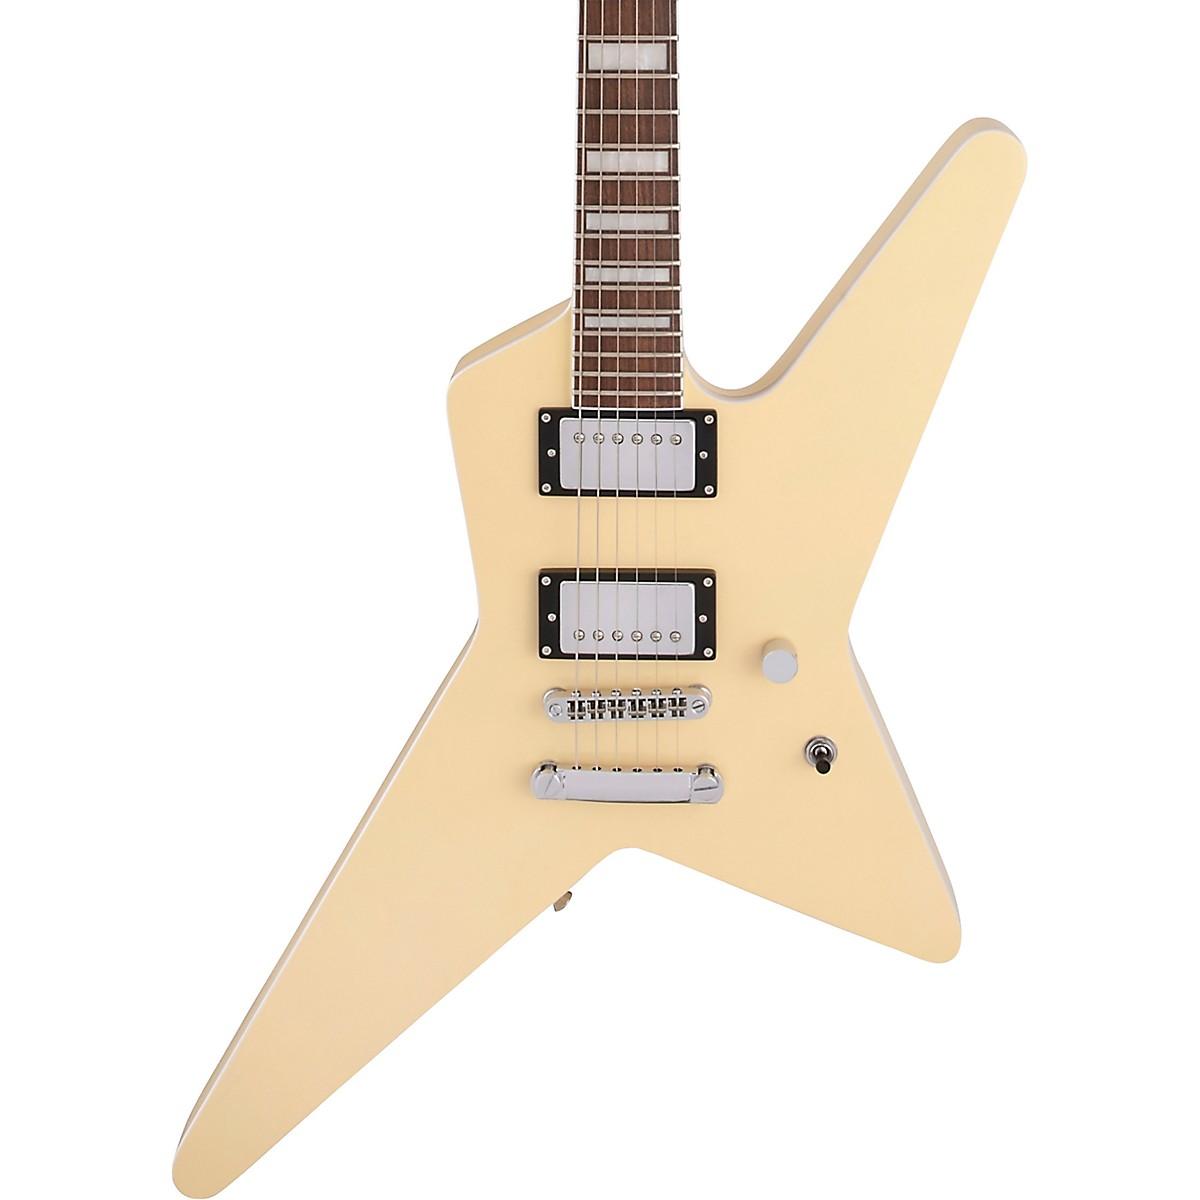 Jackson Pro Series Signature Gus G. Star Electric Guitar